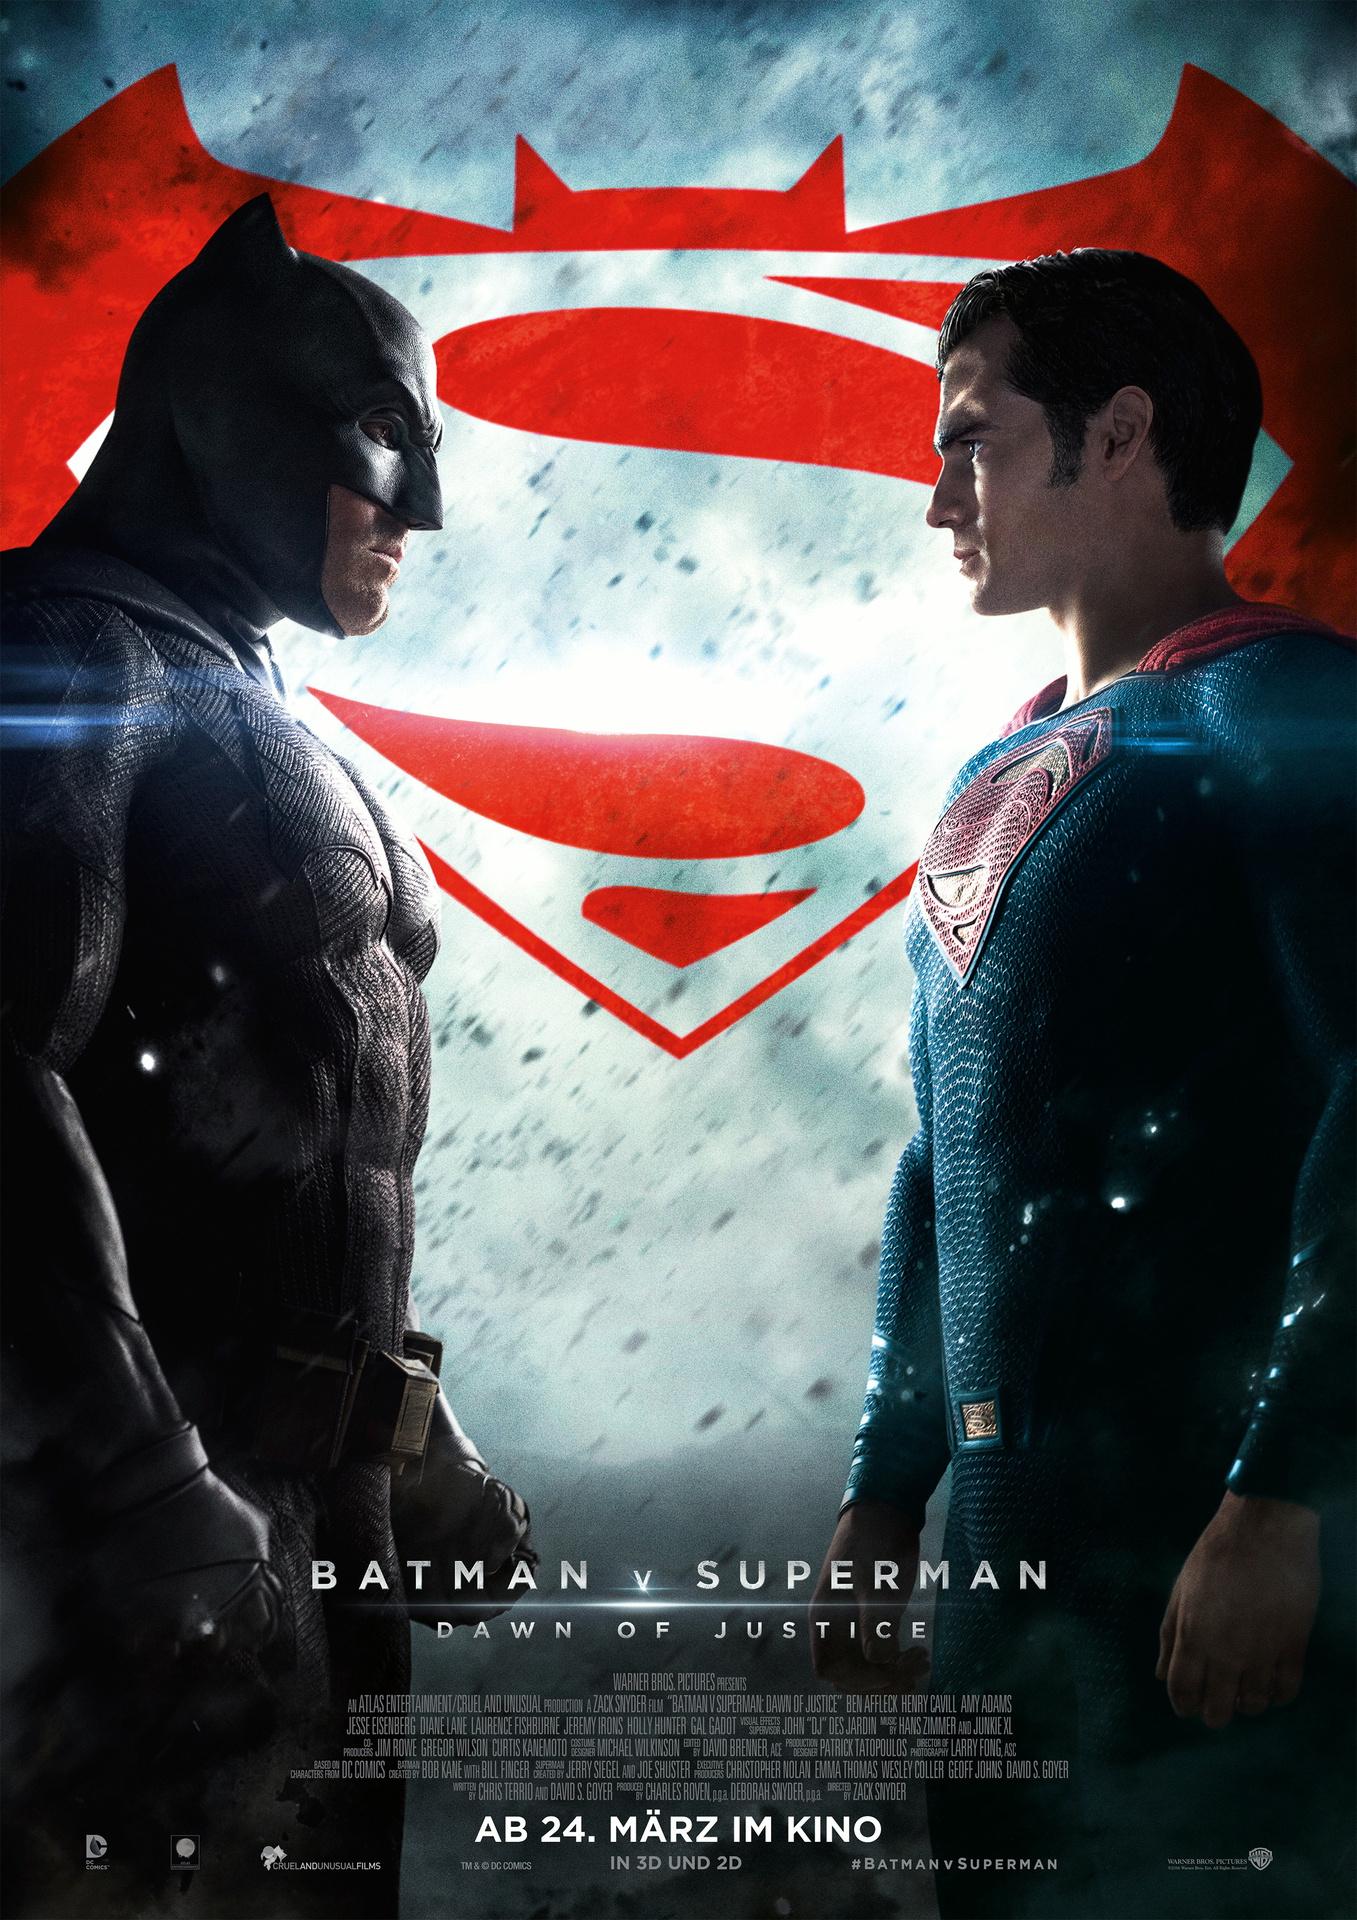 Batman v Superman: Dawn of Justice | Wessels-Filmkritik.com